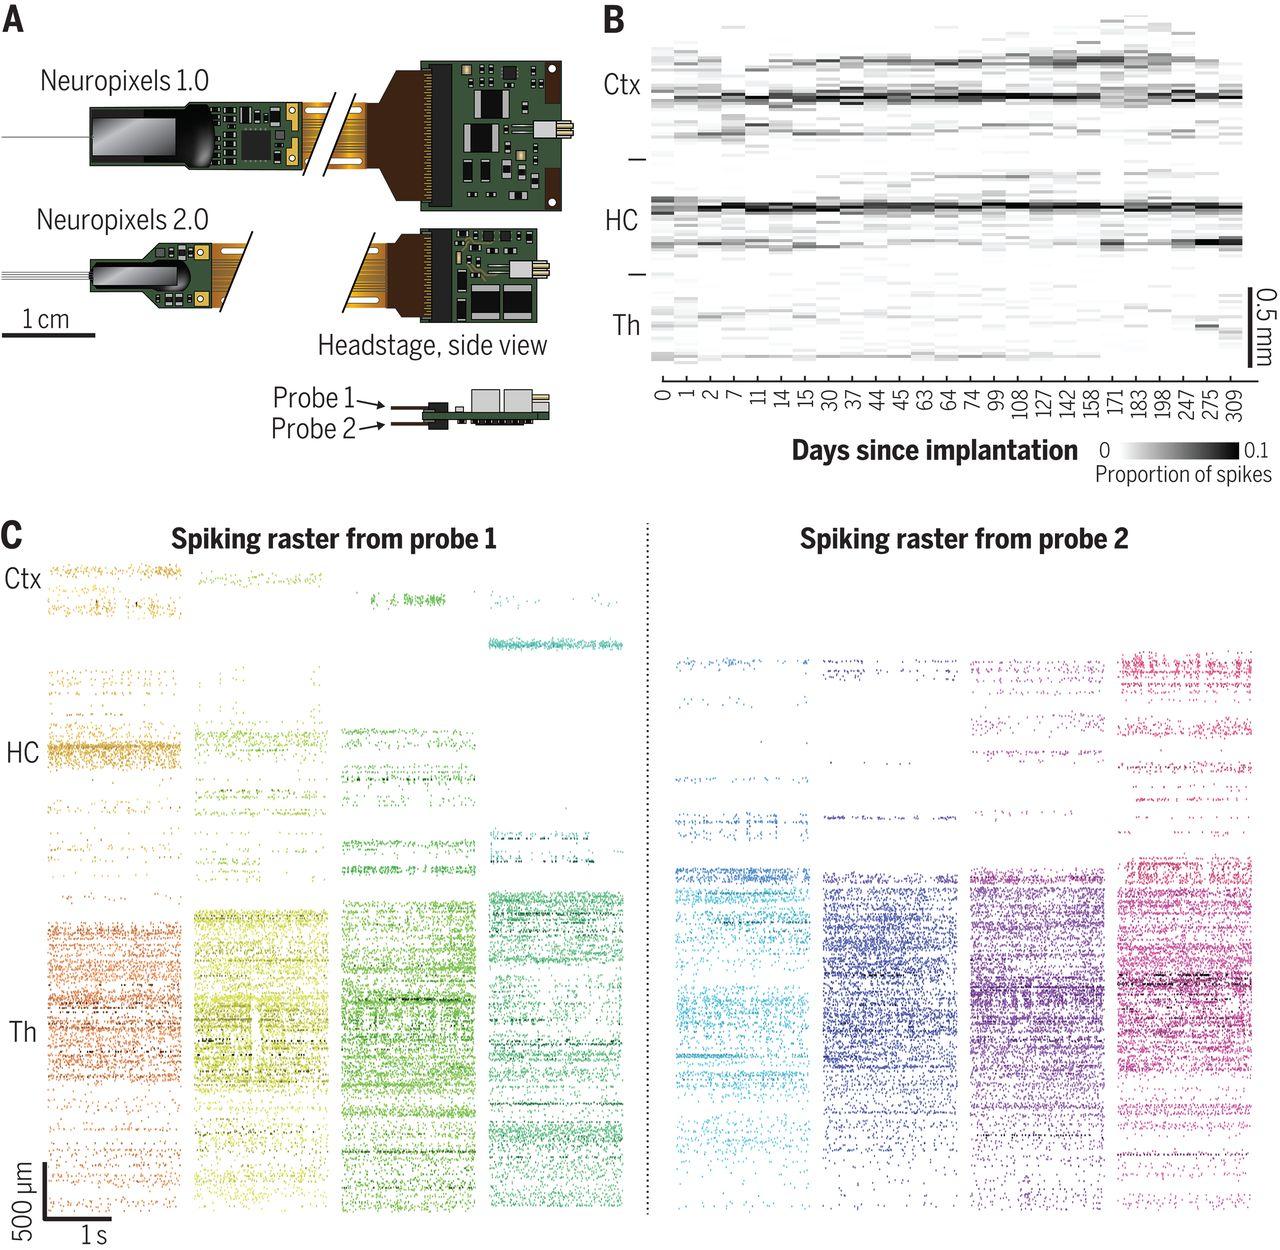 Neuropixels 2.0: A miniaturized high-density probe for stable, long-term brain recordings